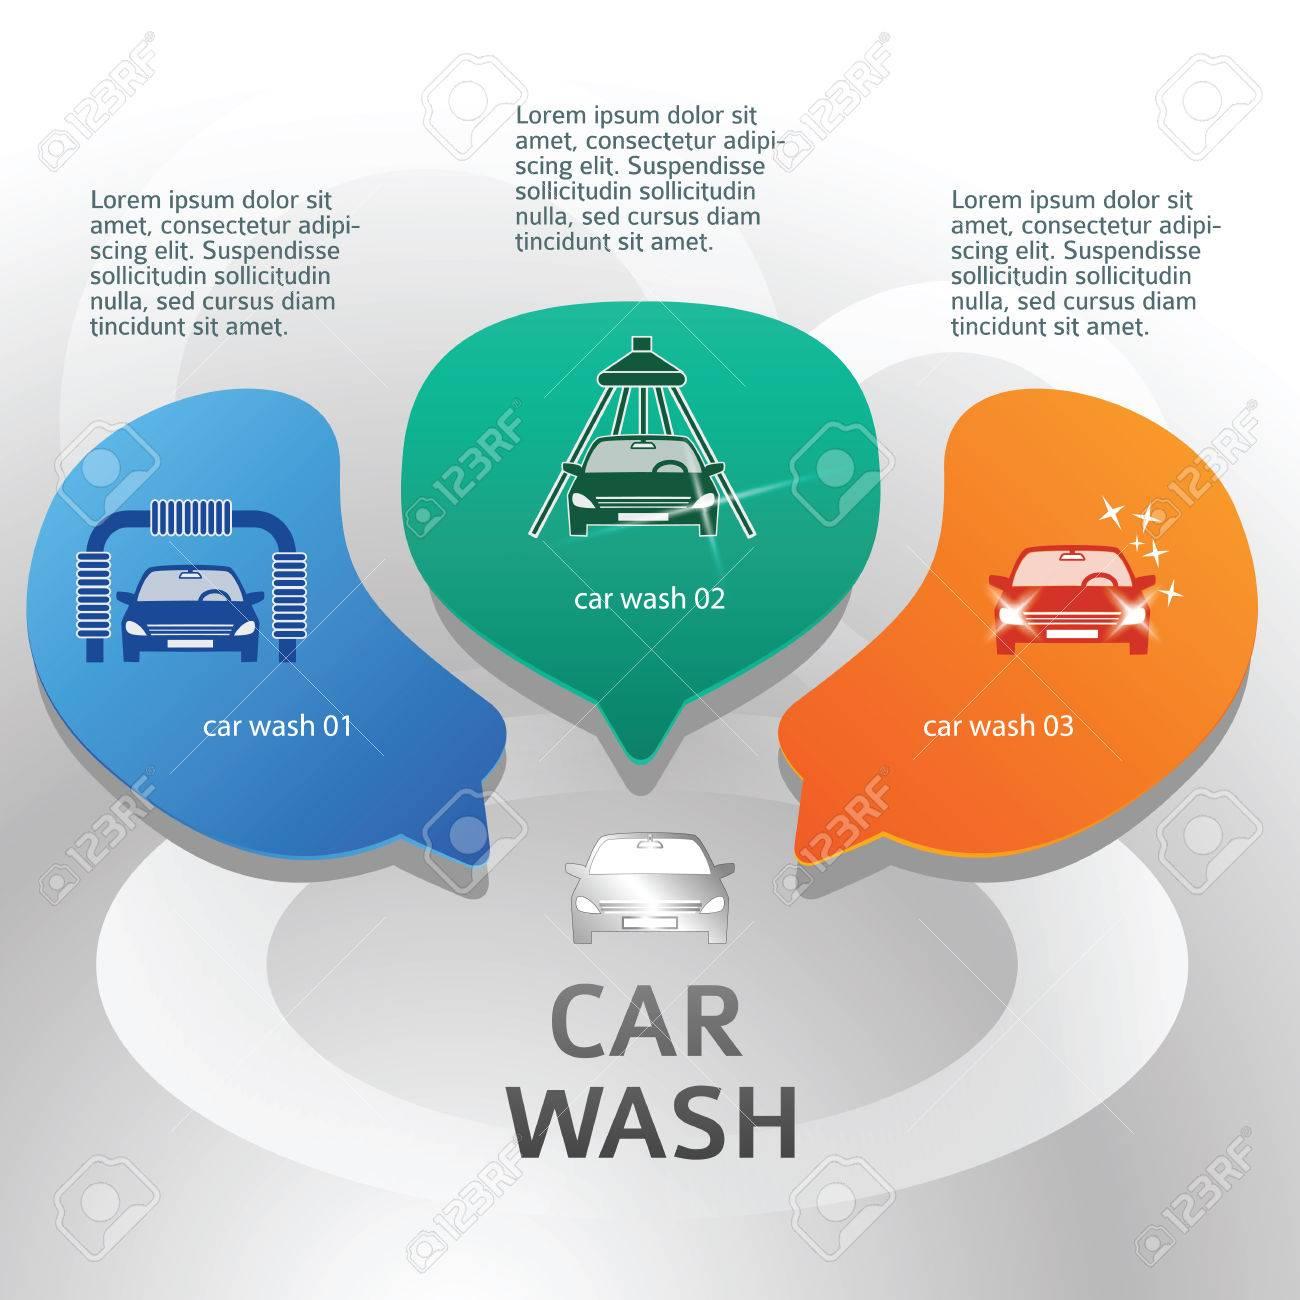 Design elements banner - Car Wash Design Elements Background With Icons On Web Banner Modern Business Presentation Template For